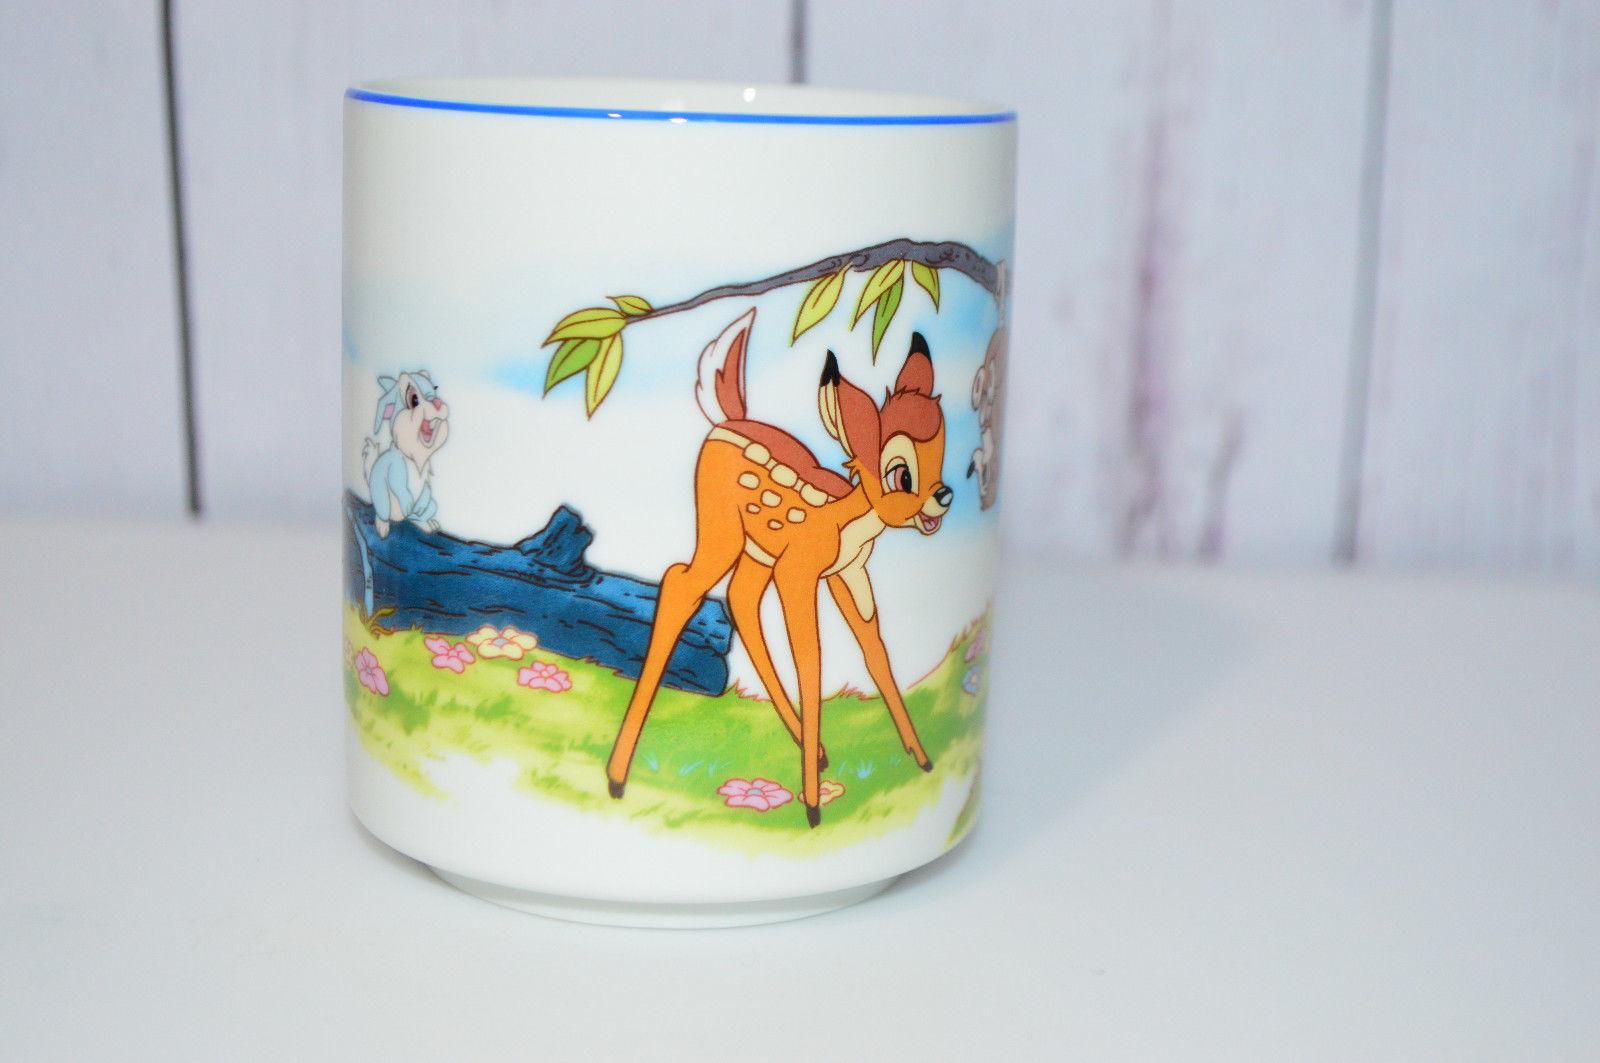 Disneyland Disney 10 Items World Mug Similar Bambi And Walt jLUzpGSMqV